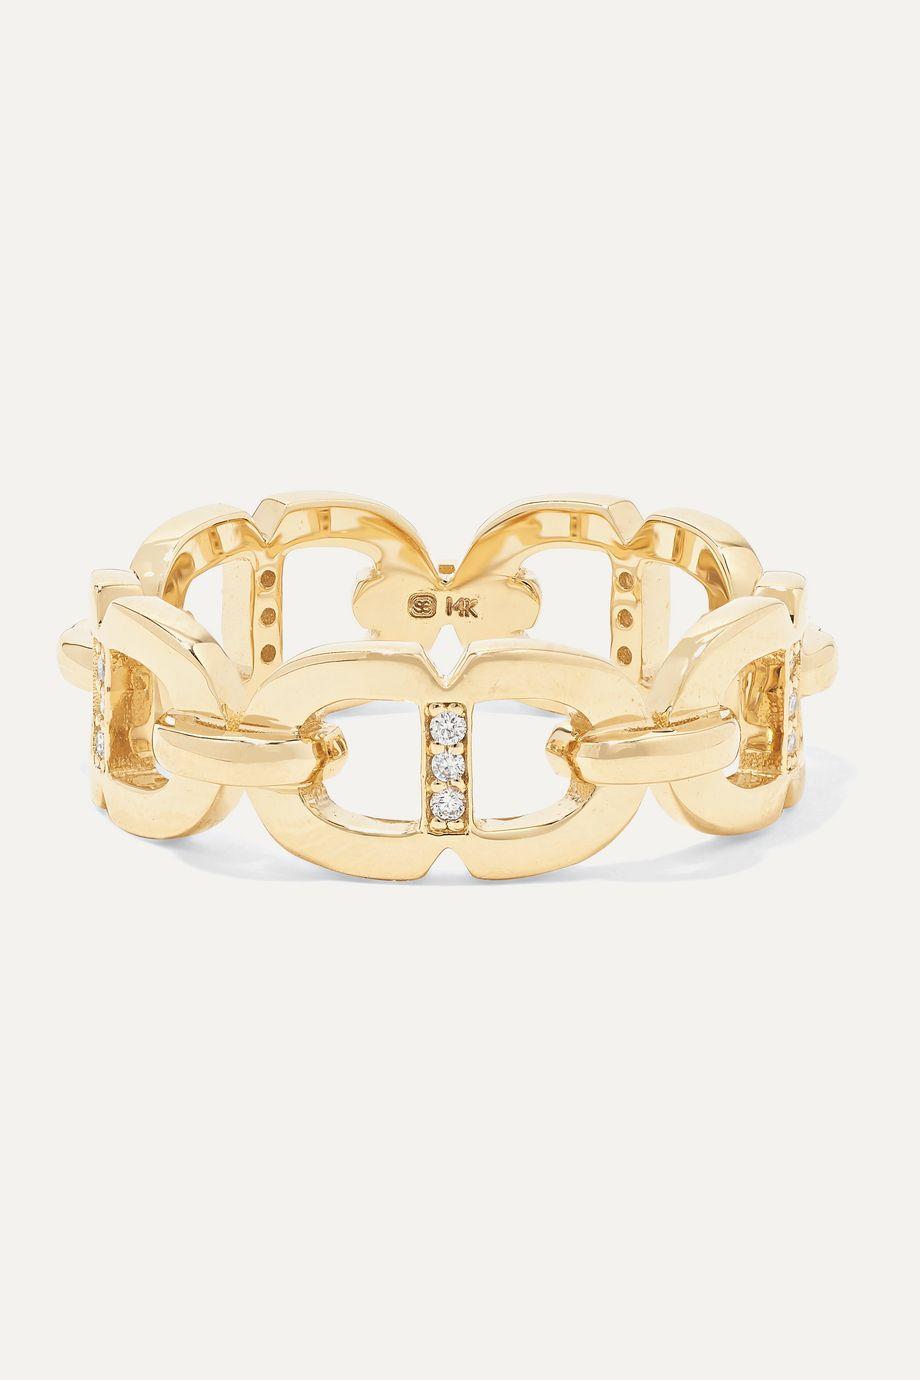 Sydney Evan 14-karat gold diamond ring